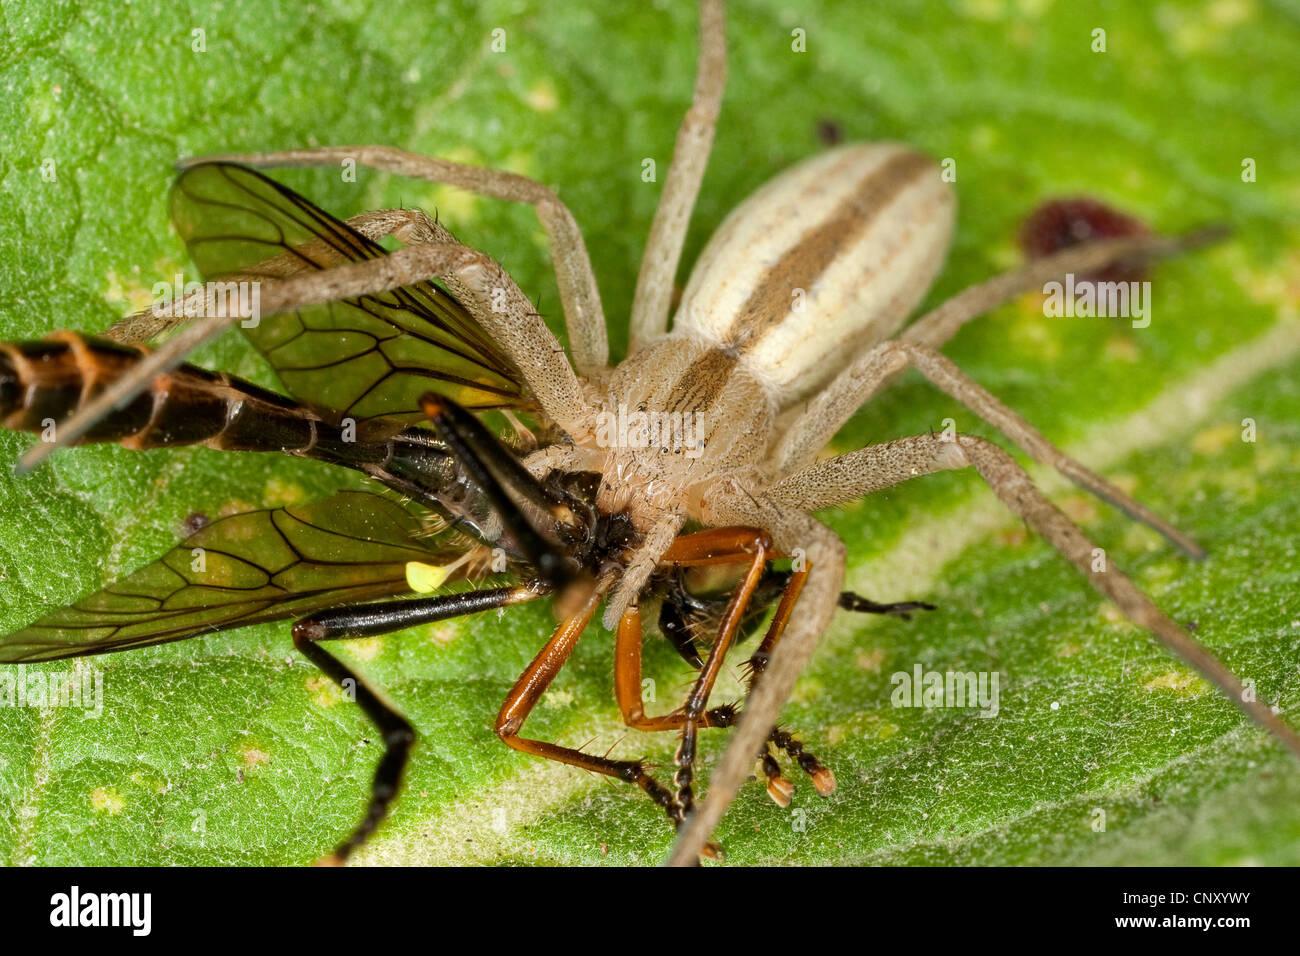 Crab spider preying bumble bee garden spiders spiders flower spiders - Running Crab Spider Philodromid Philodromid Spider Tibellus Oblongus With Prey